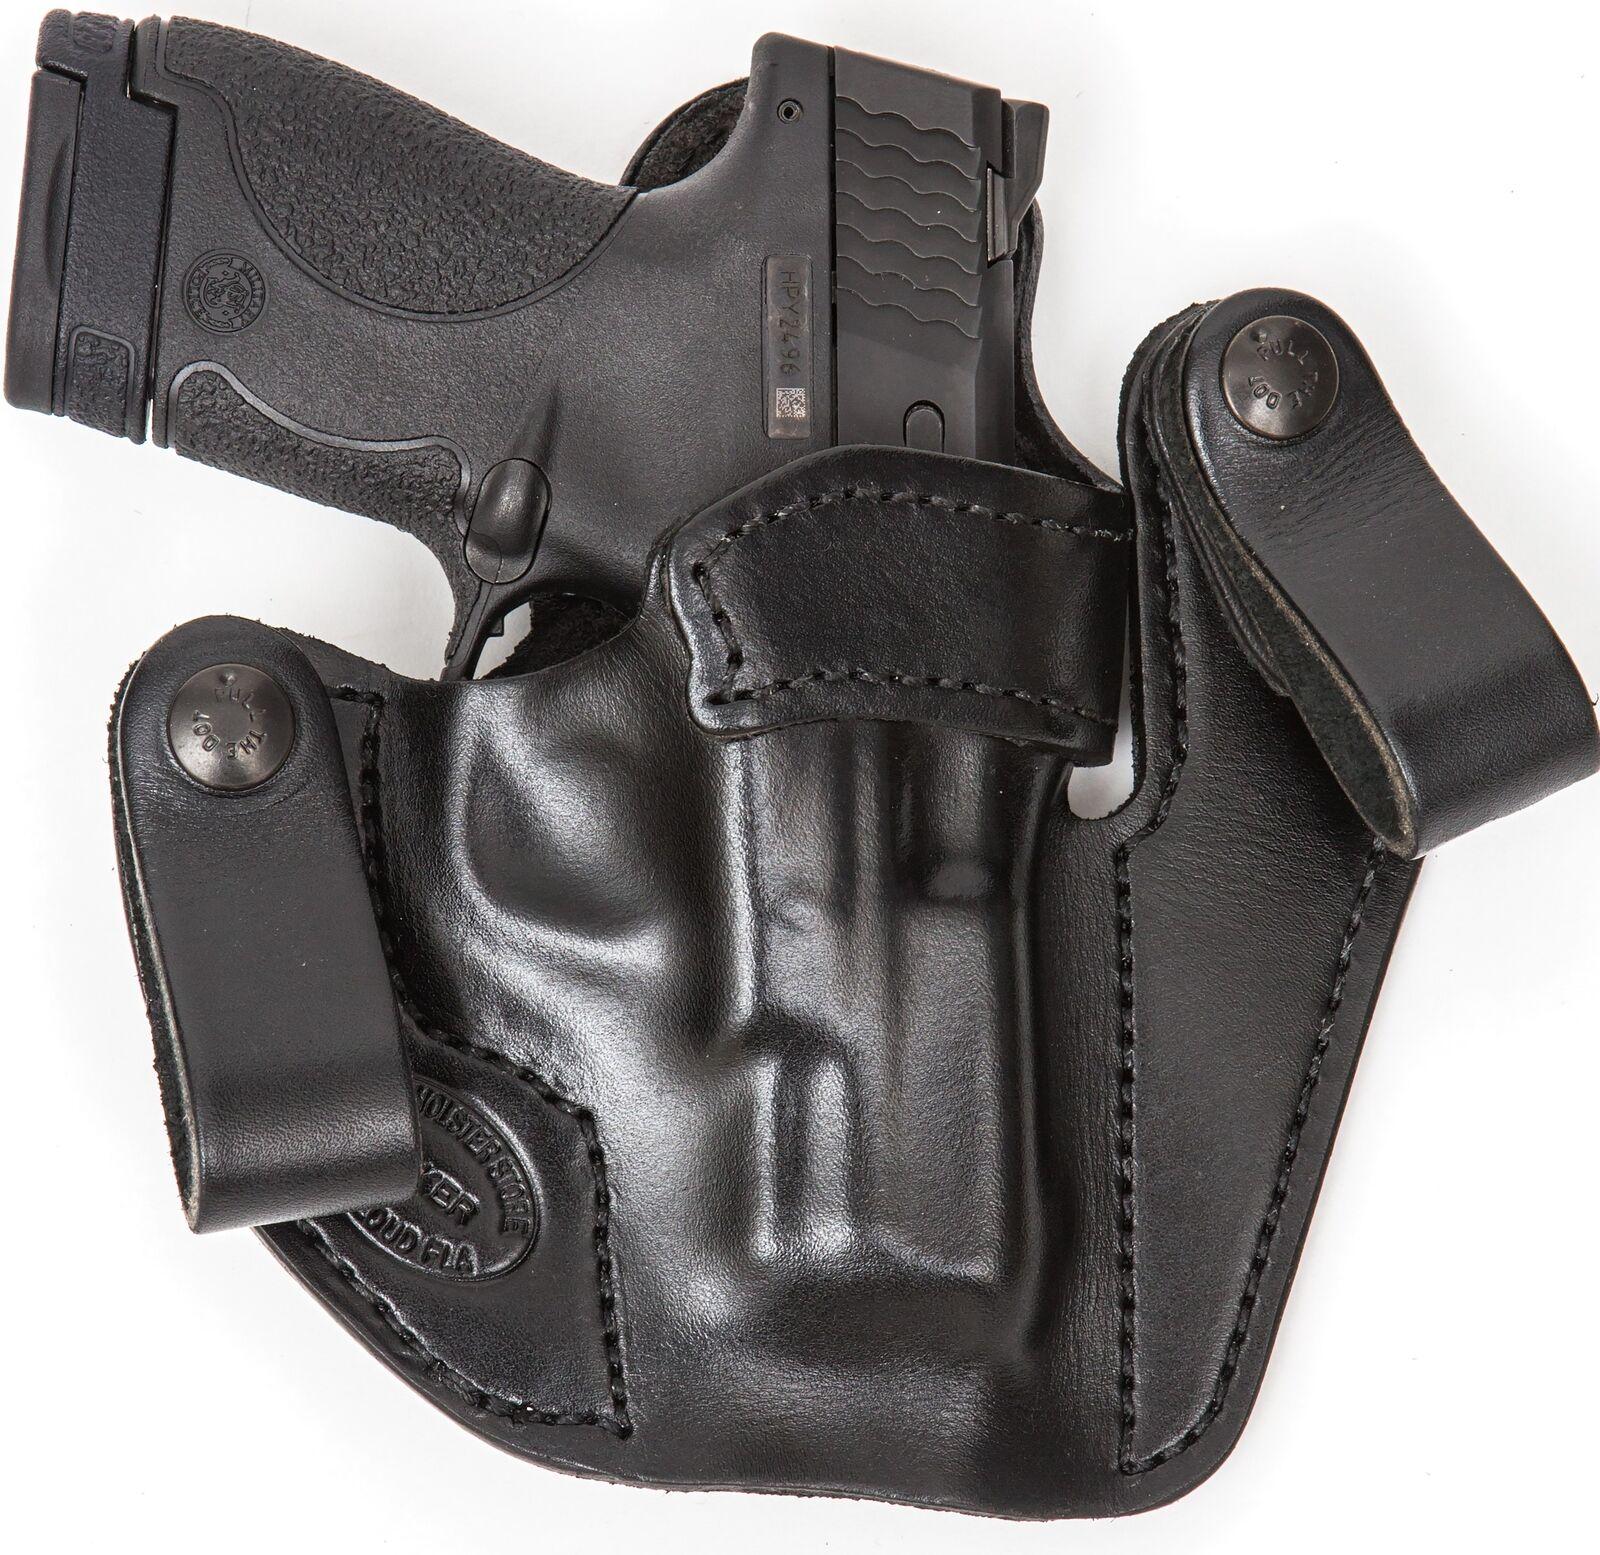 Xtreme llevar RH LH IWB Cuero Funda Pistola para para Stealth